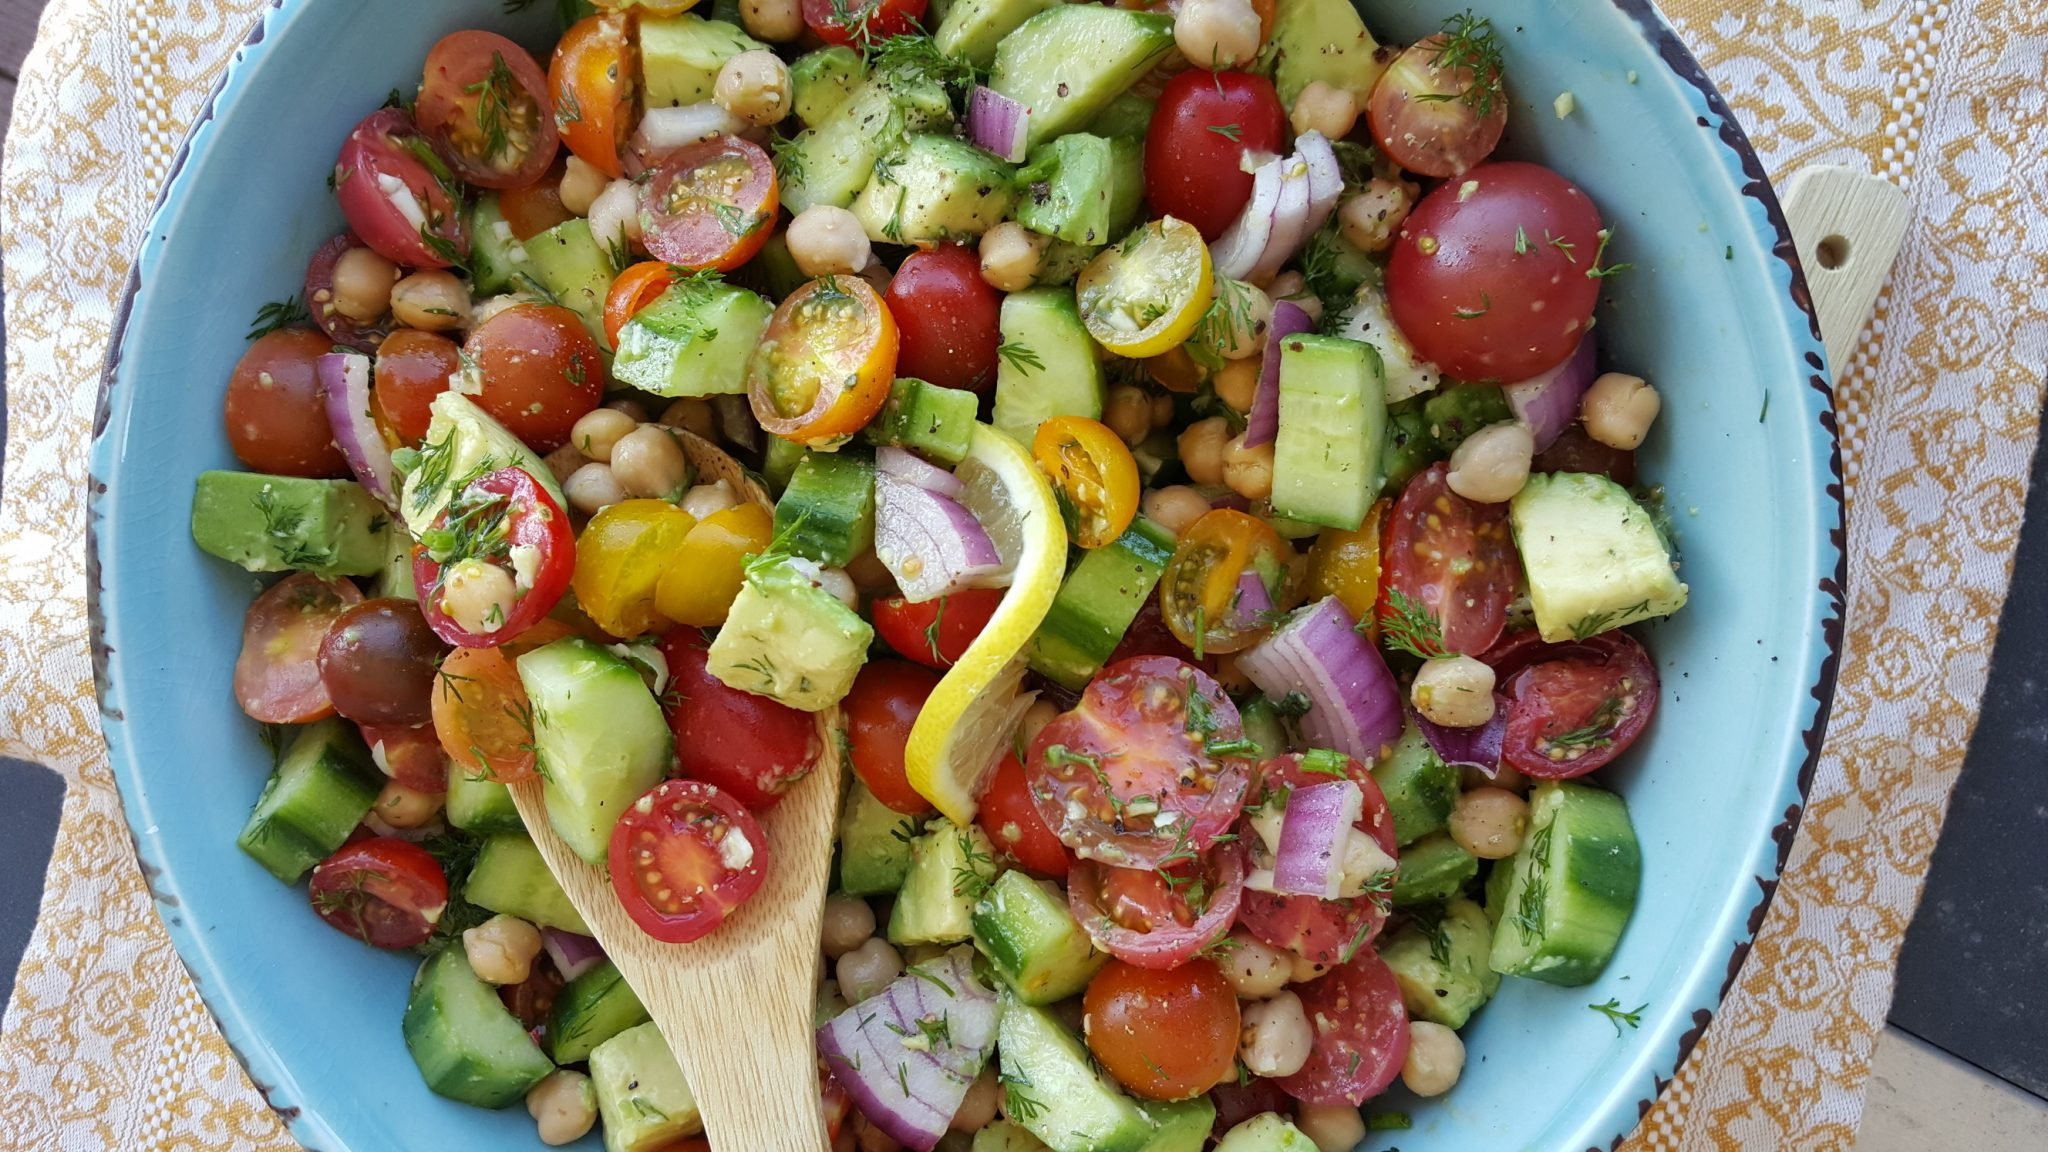 Chopped Mixed Tomato + Crisp Cucumber Salad with Lemony Dill